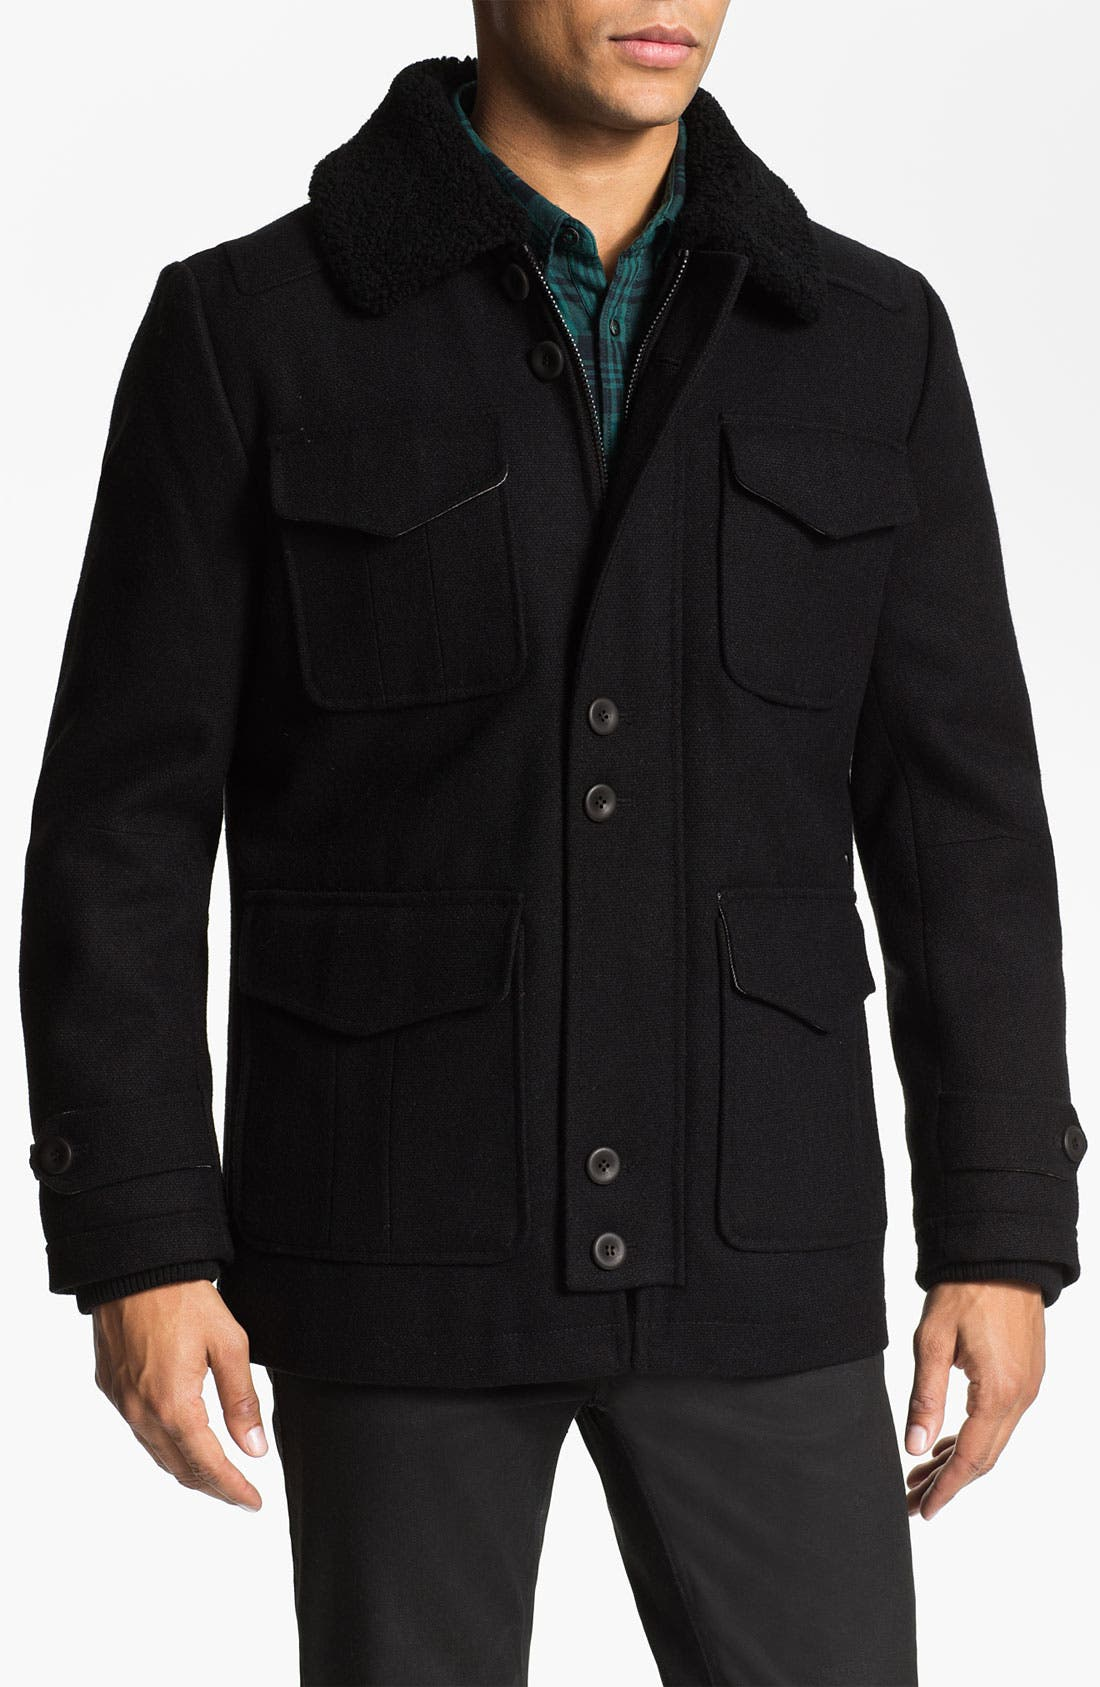 Alternate Image 1 Selected - PLECTRUM by Ben Sherman Shearling Collar Field Jacket